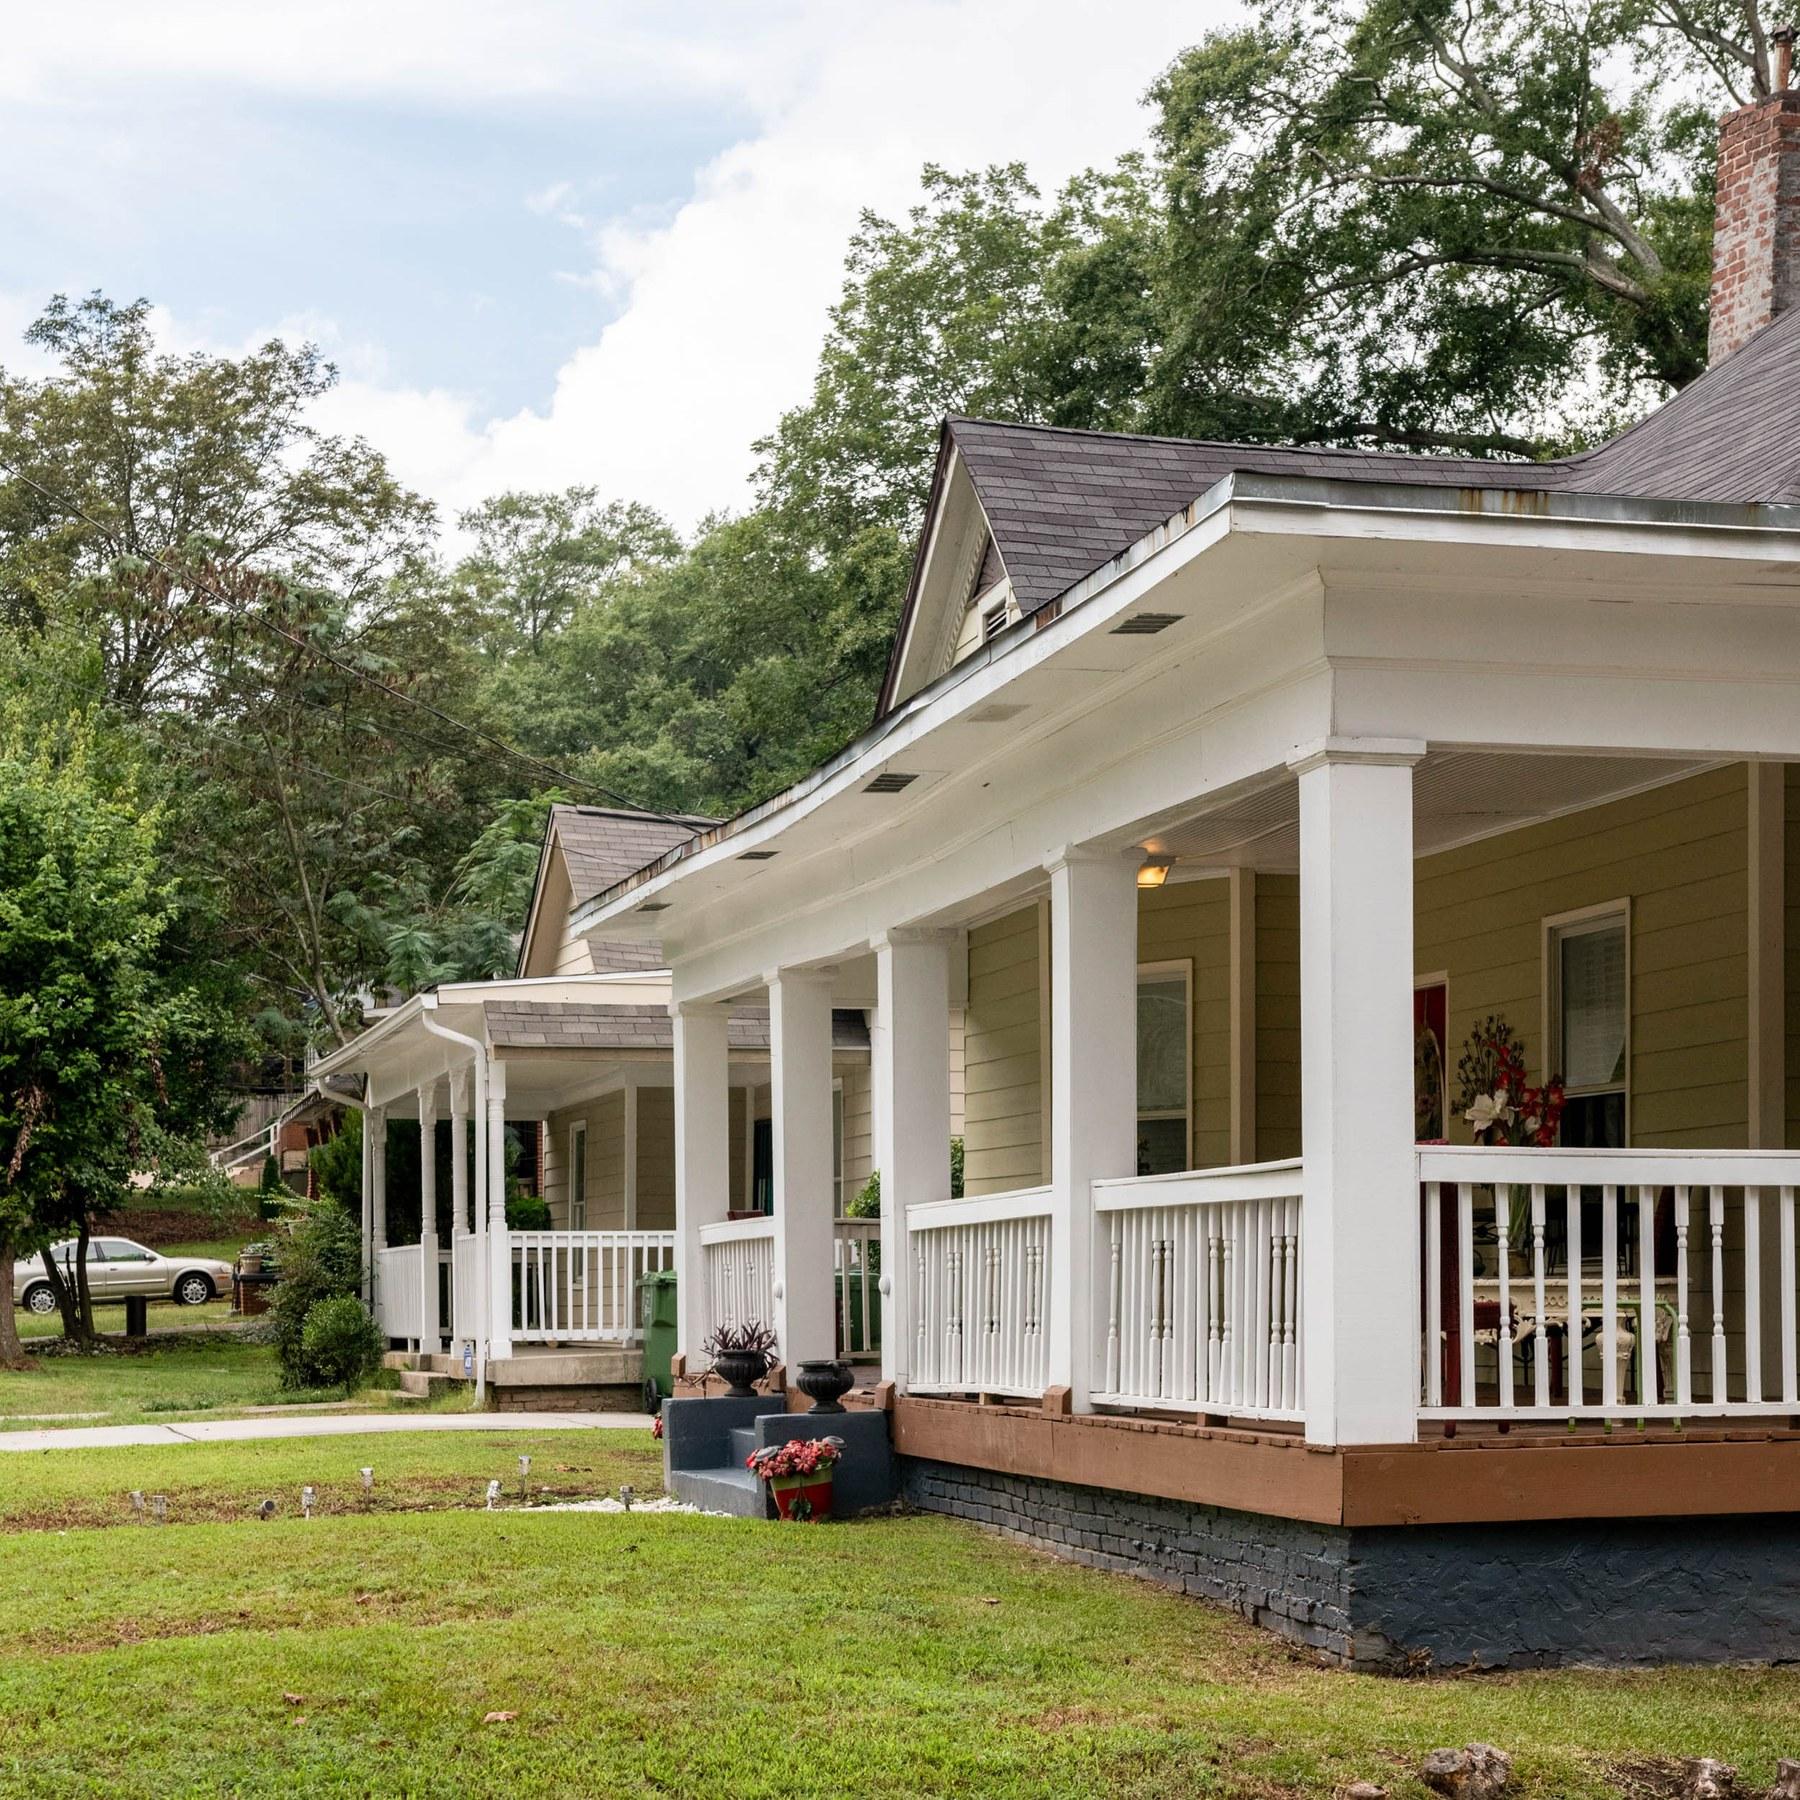 West End, Atlanta GA - Neighborhood Guide